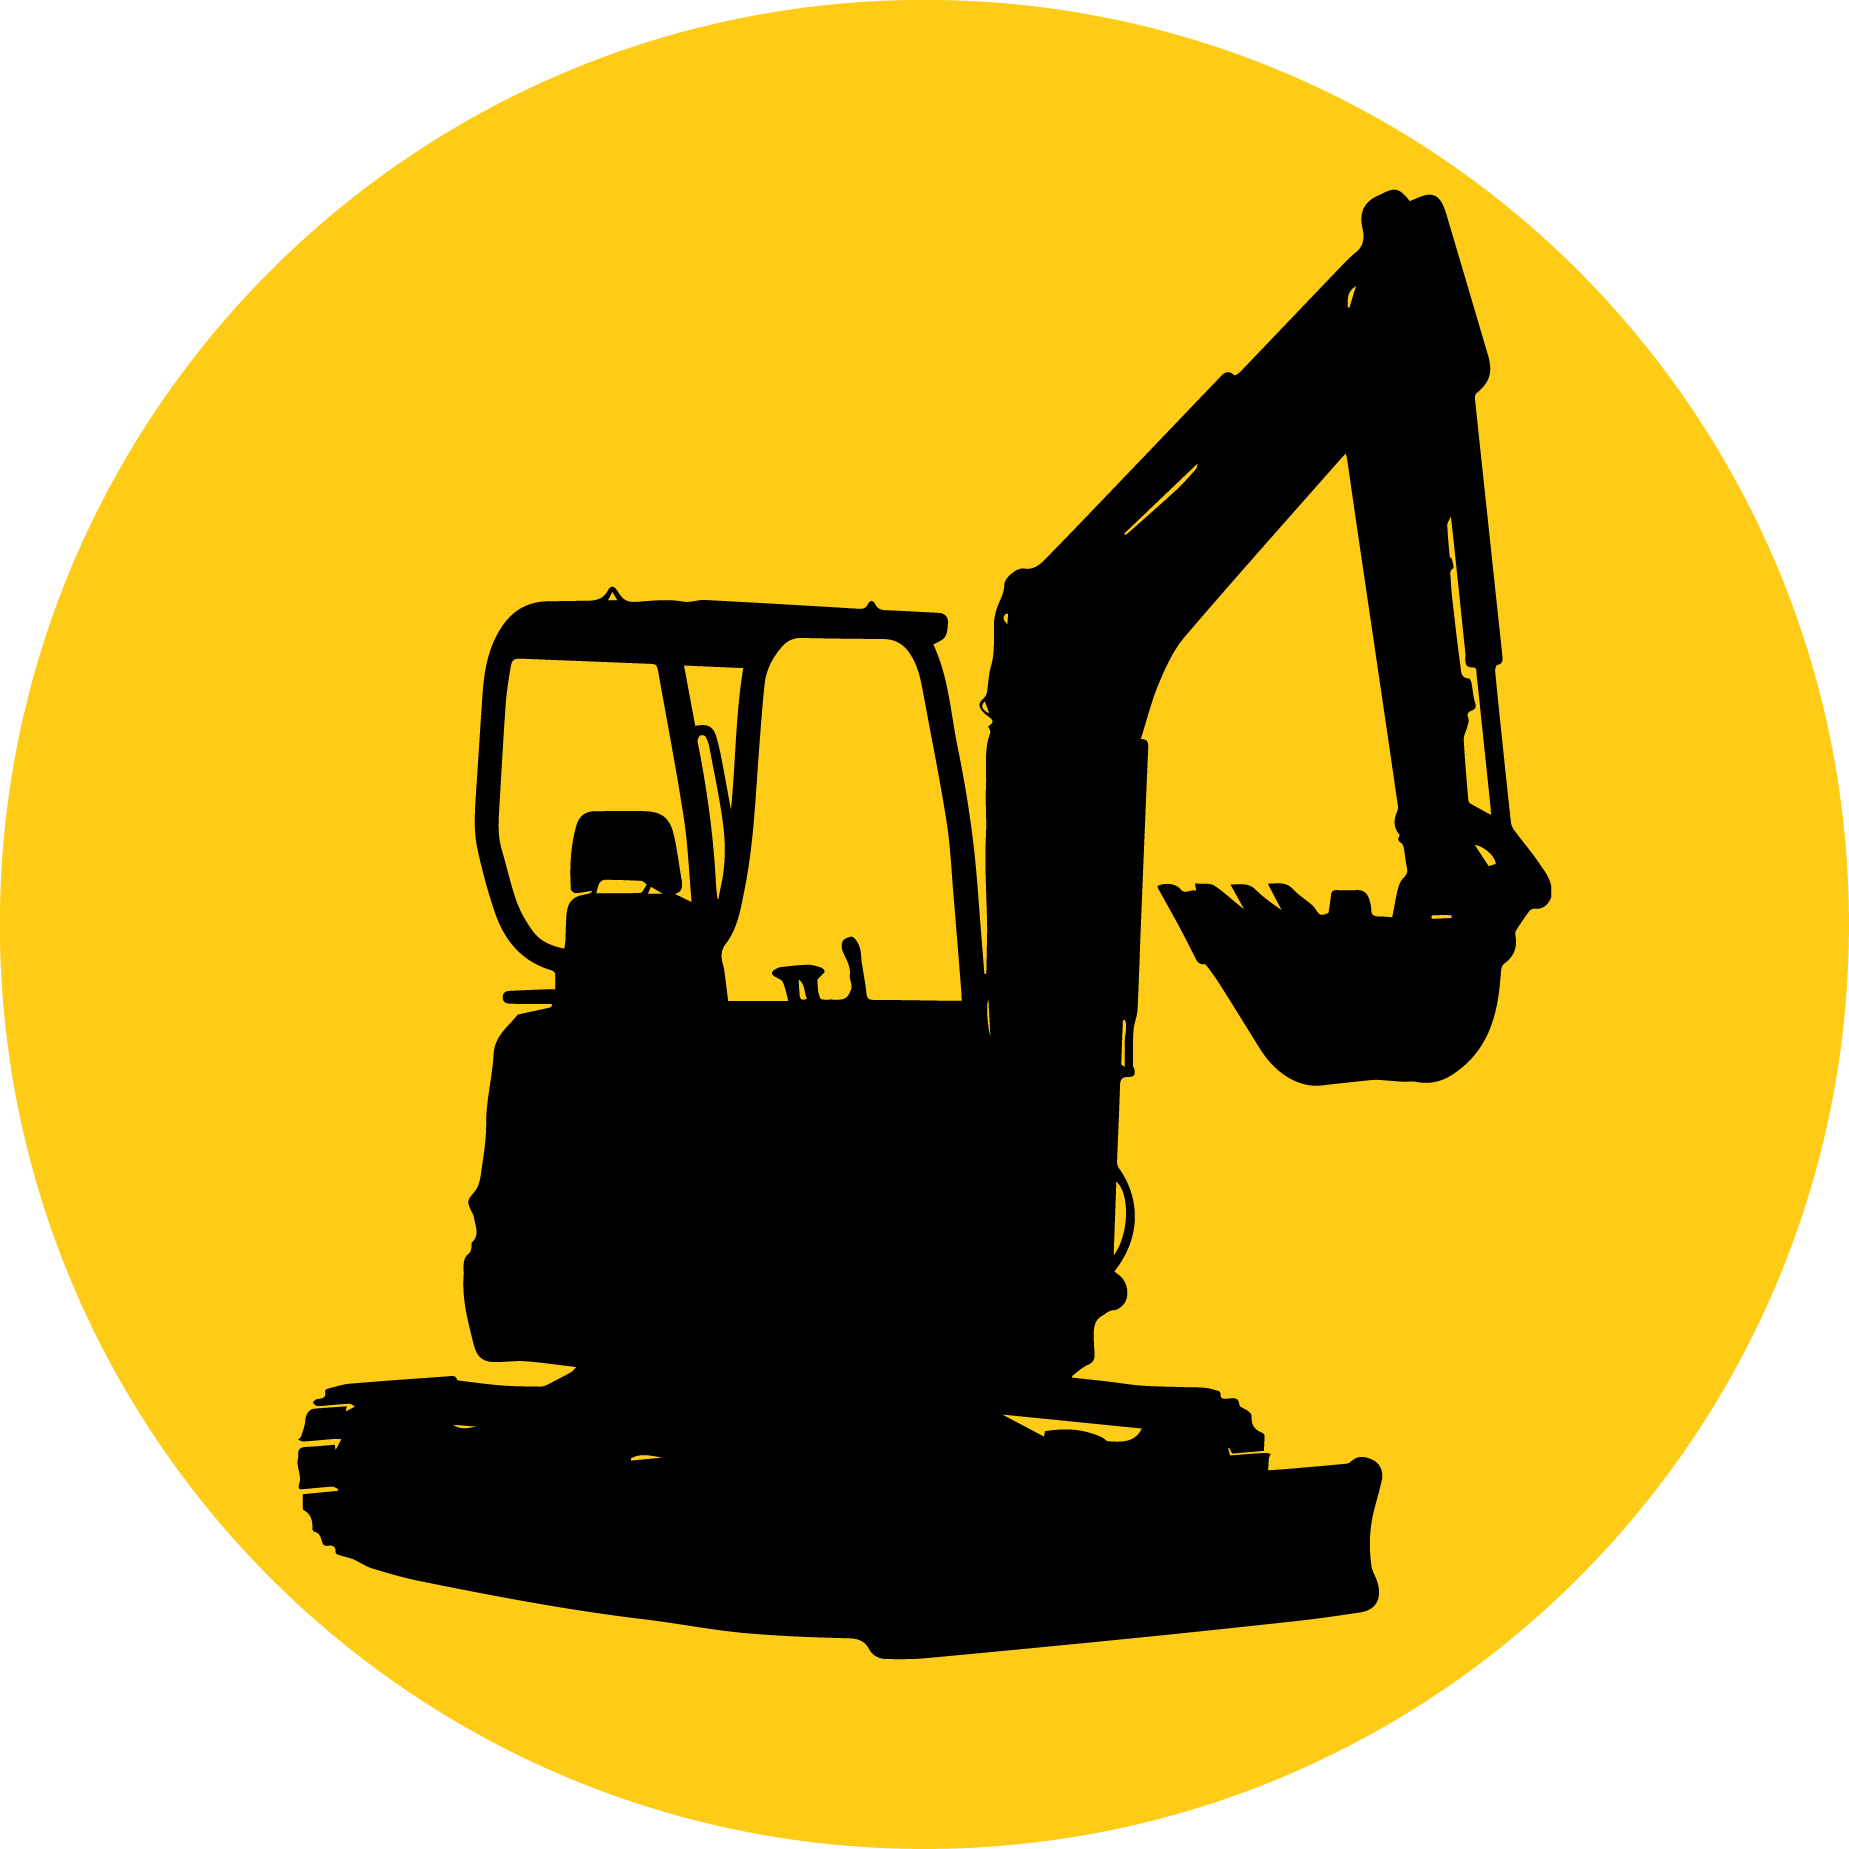 Excavator clipart excavator bobcat. Compact kubota corporation architectural